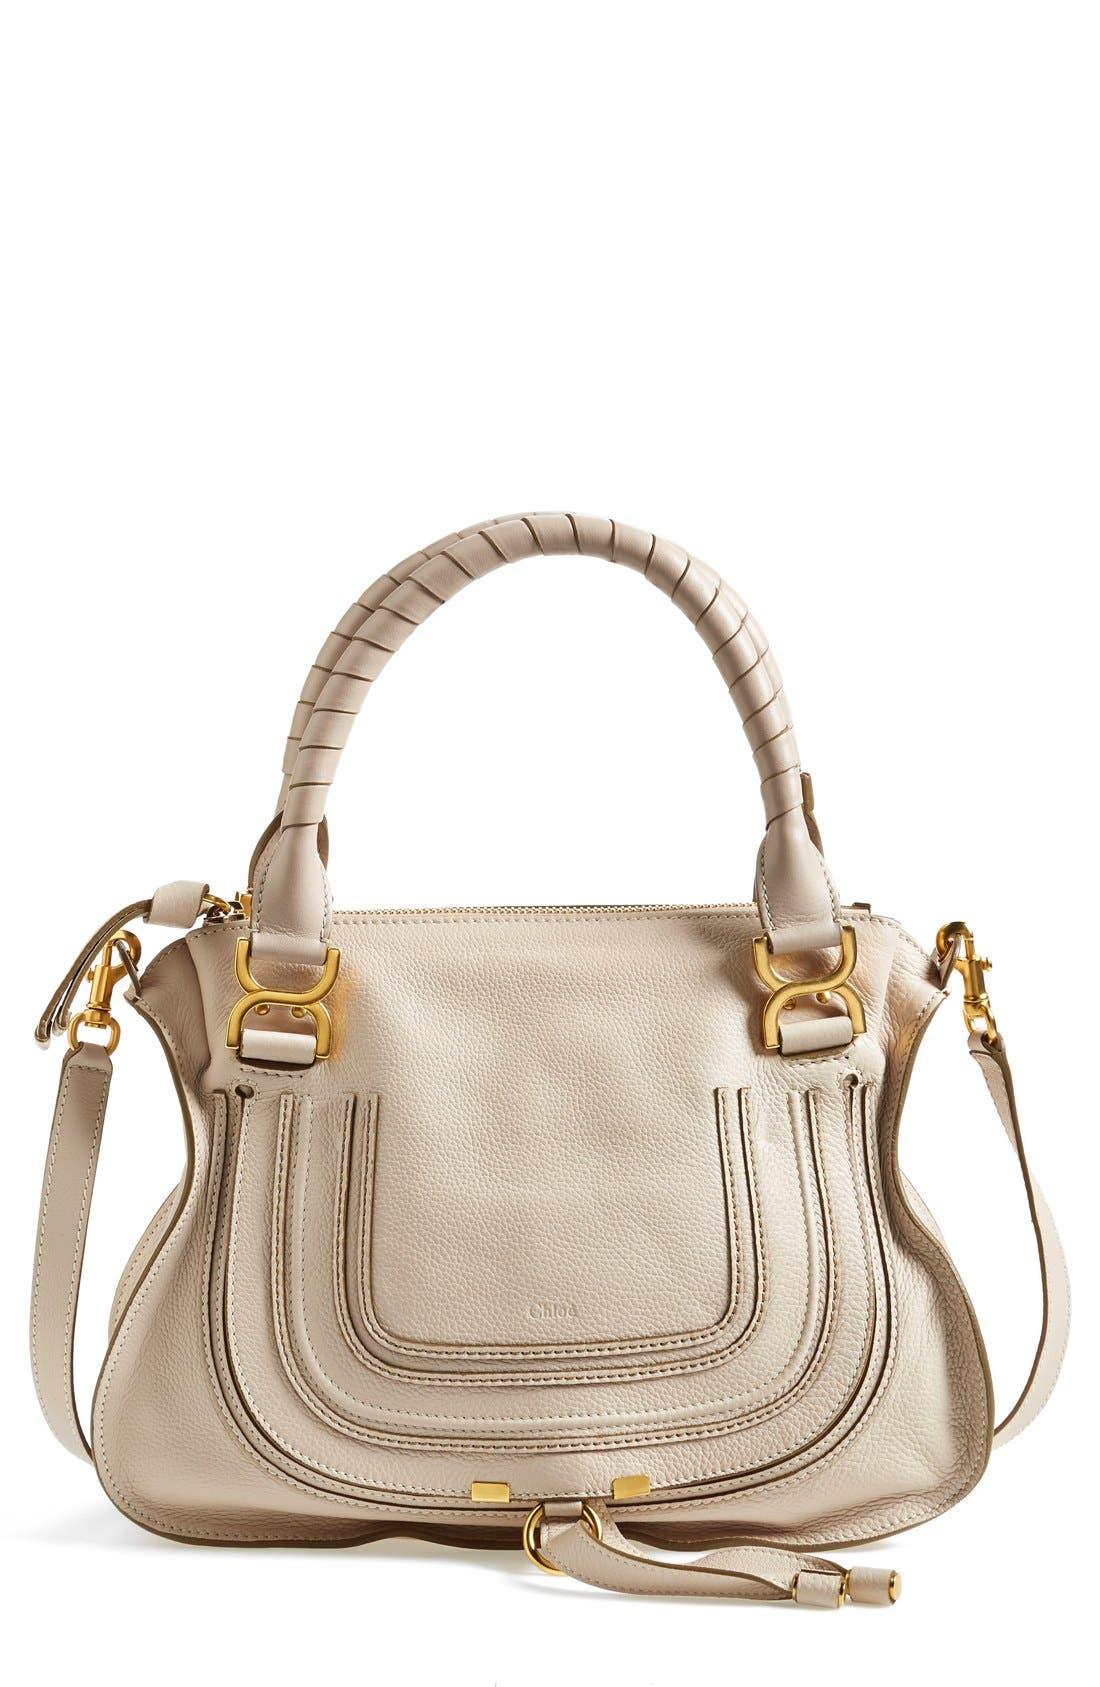 Satchel Purses & Handbags | Nordstrom